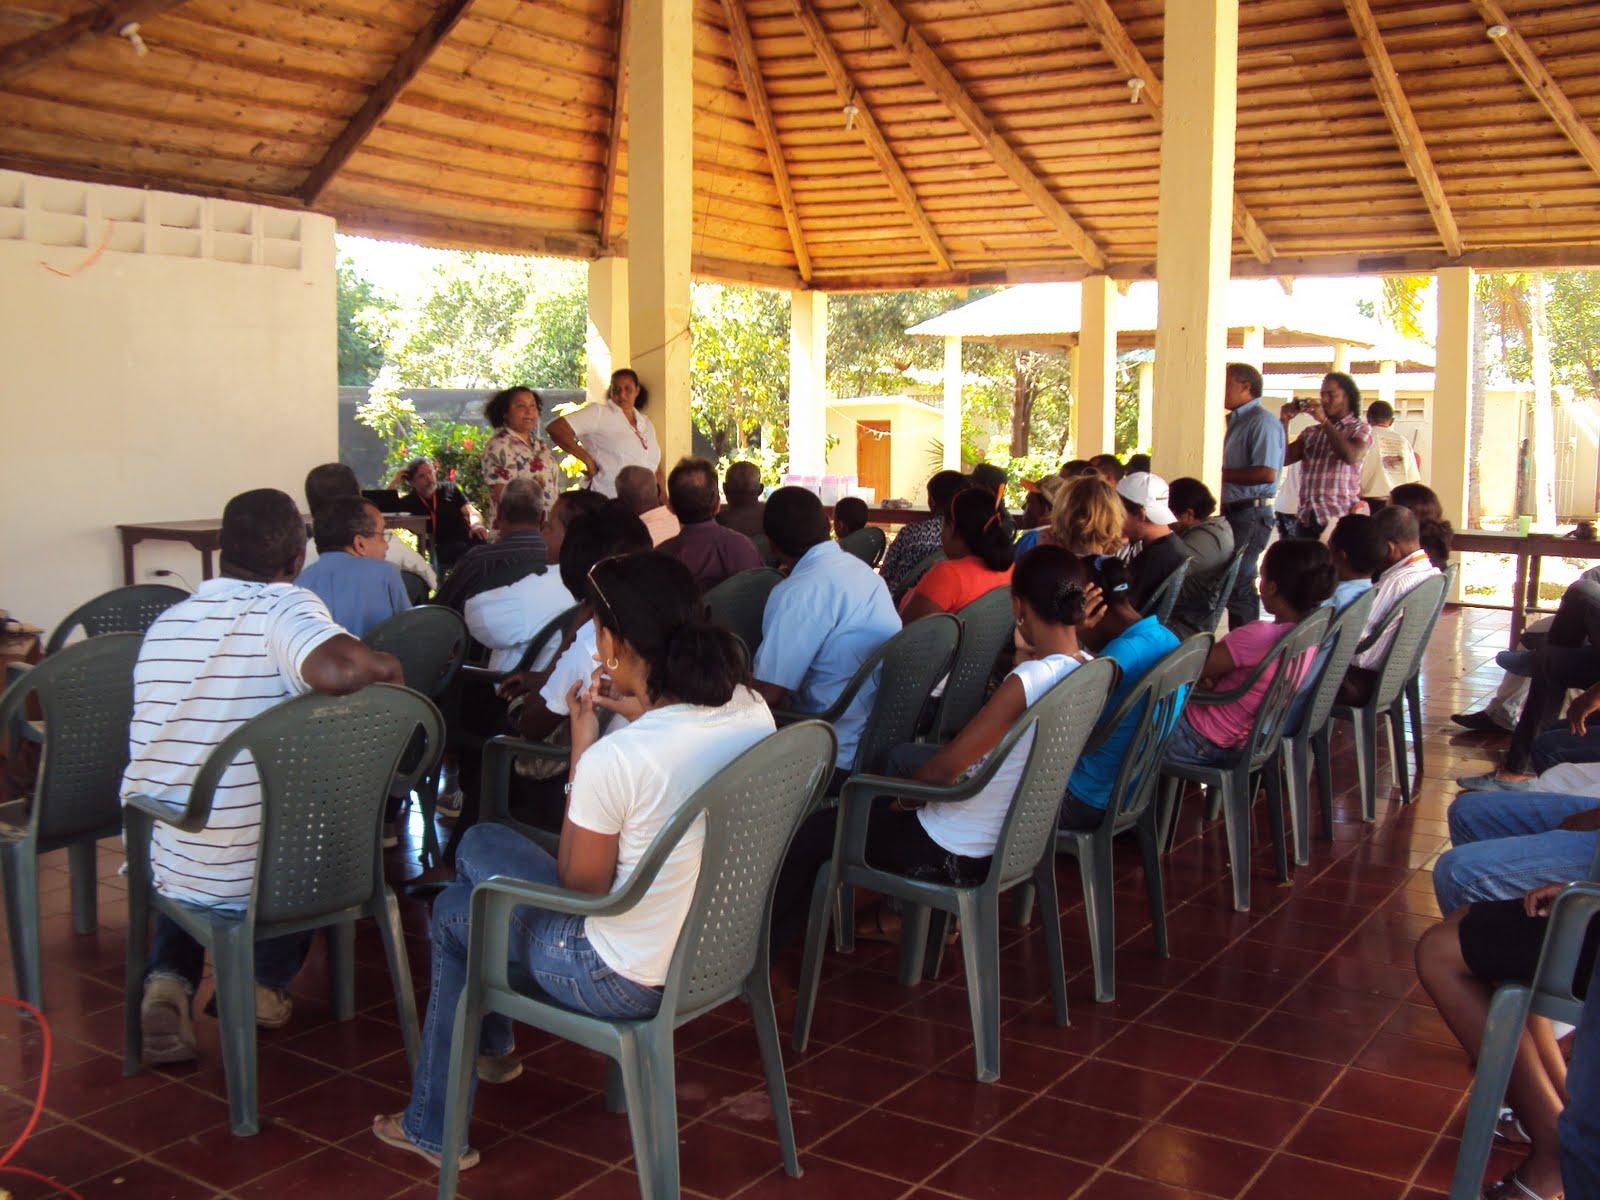 Jard n bot nico y el grupo jaragua clausuraron taller for Jardin botanico talleres